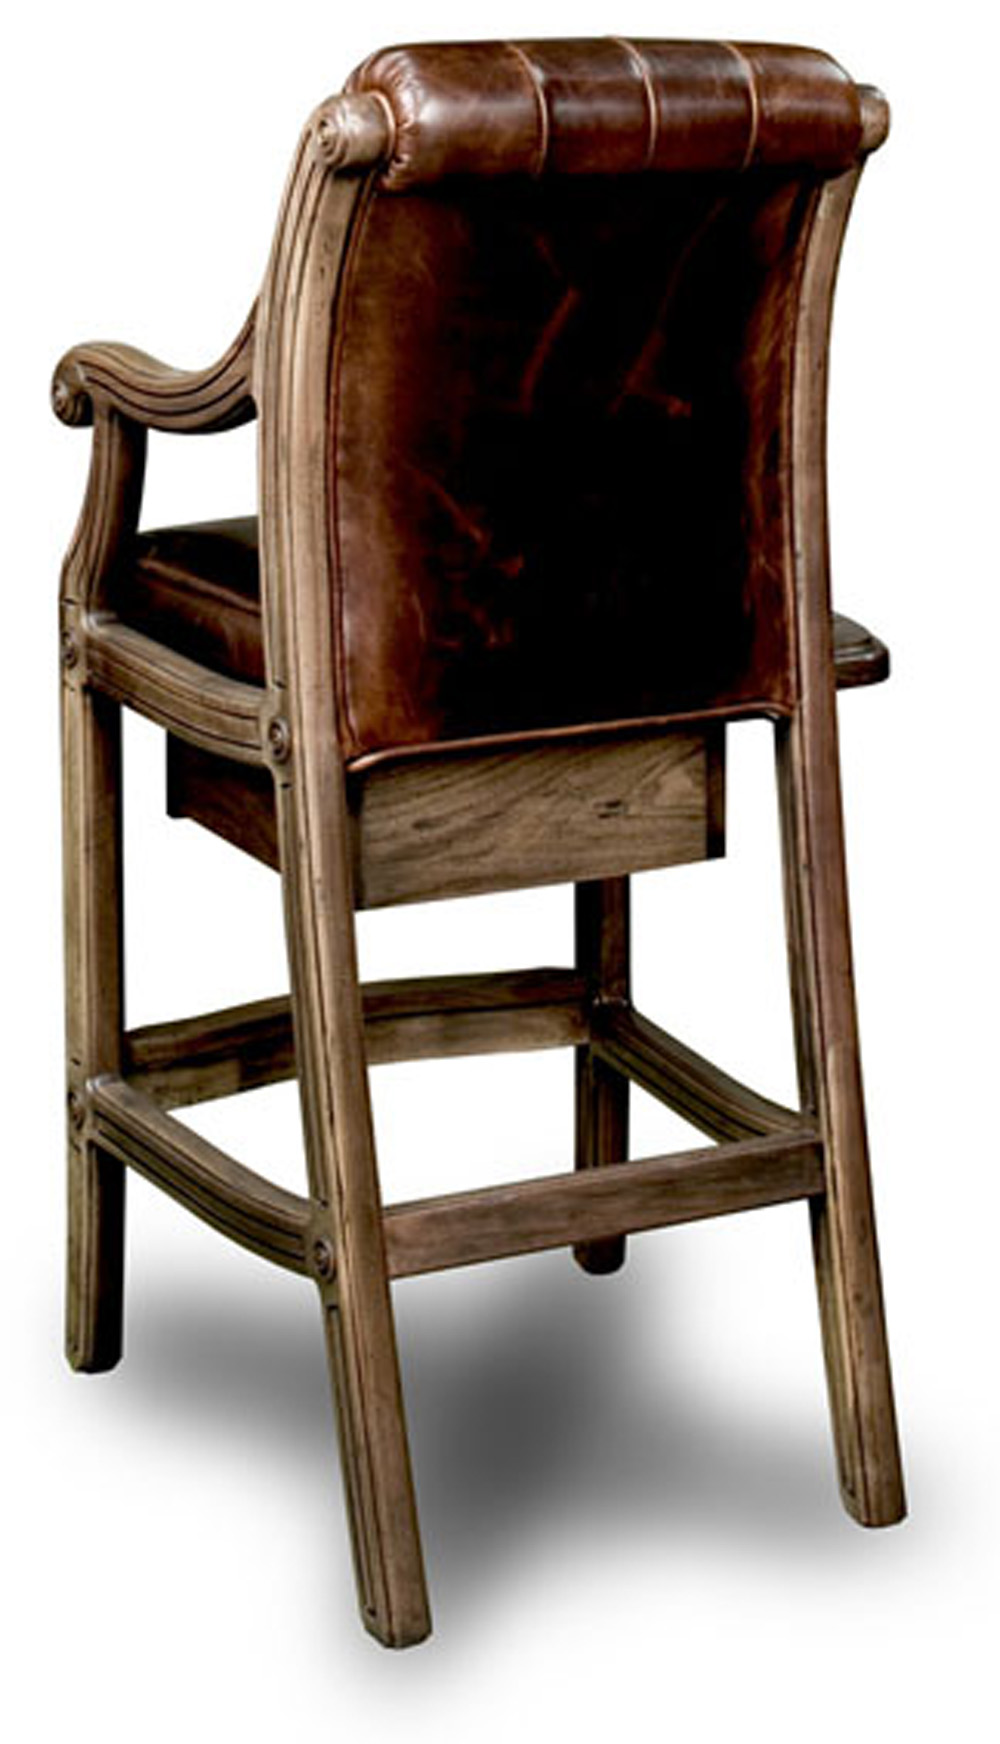 CR430 Spectator Chair